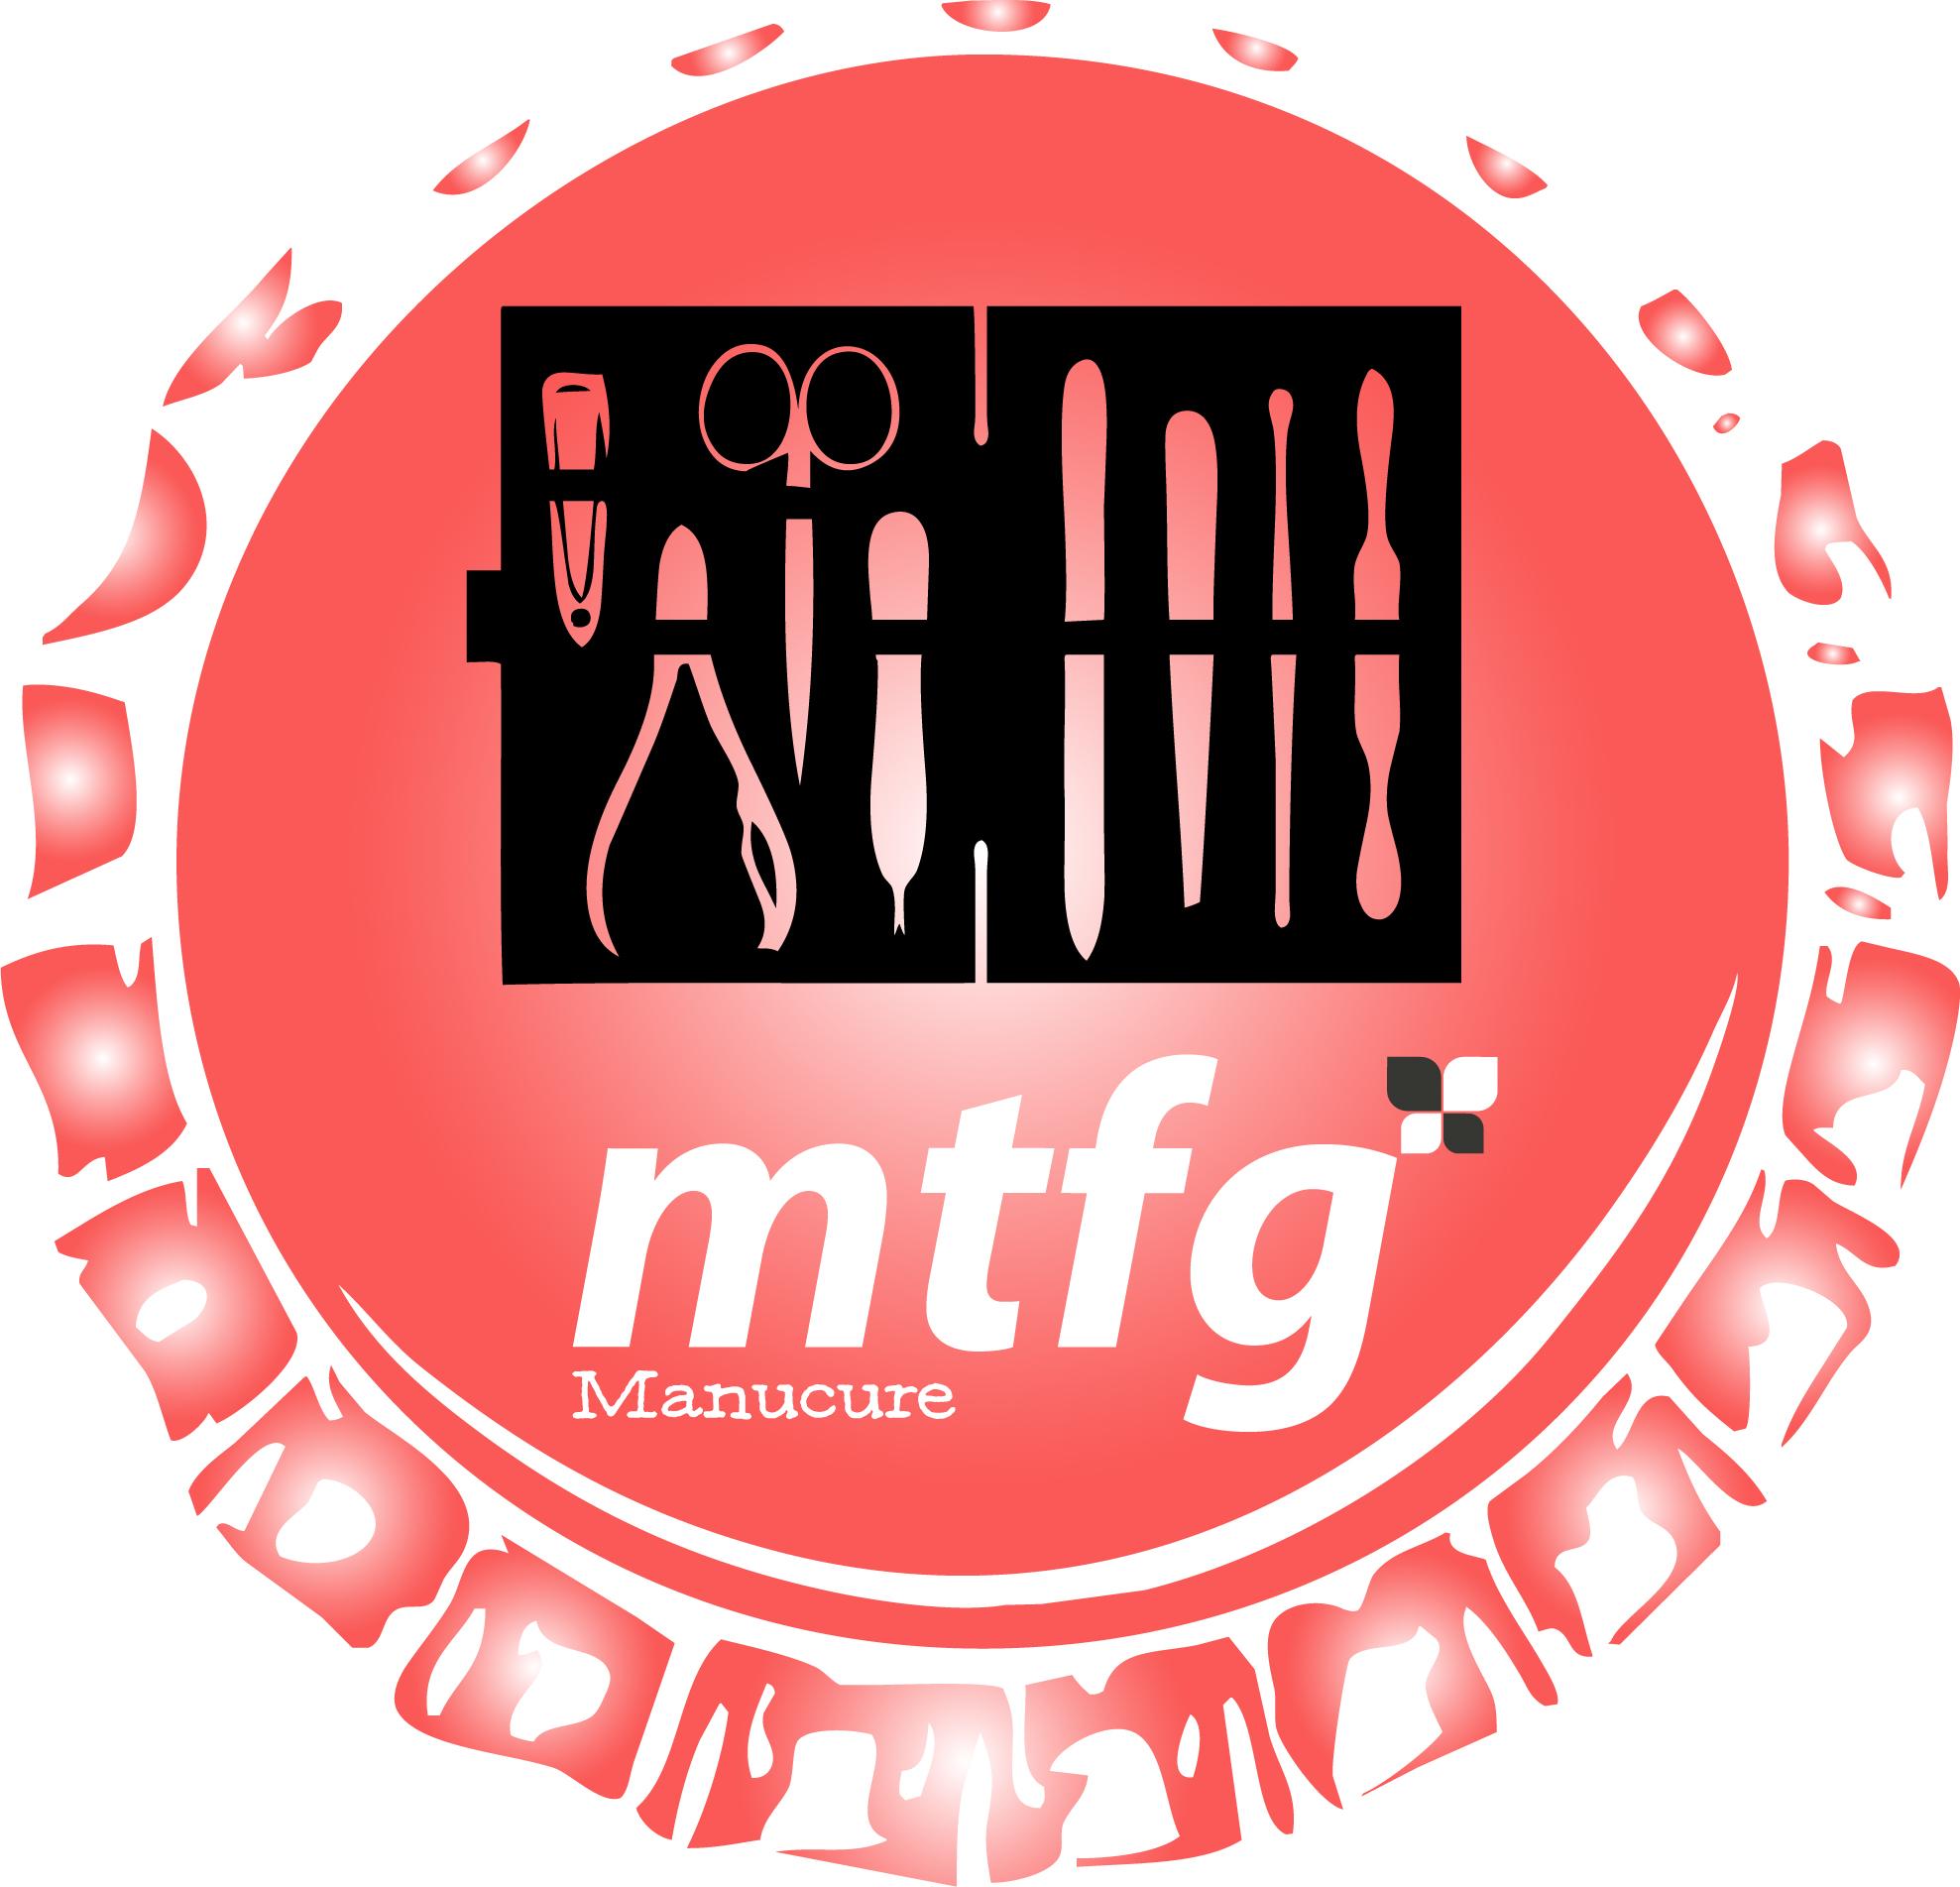 MTFG Manucure